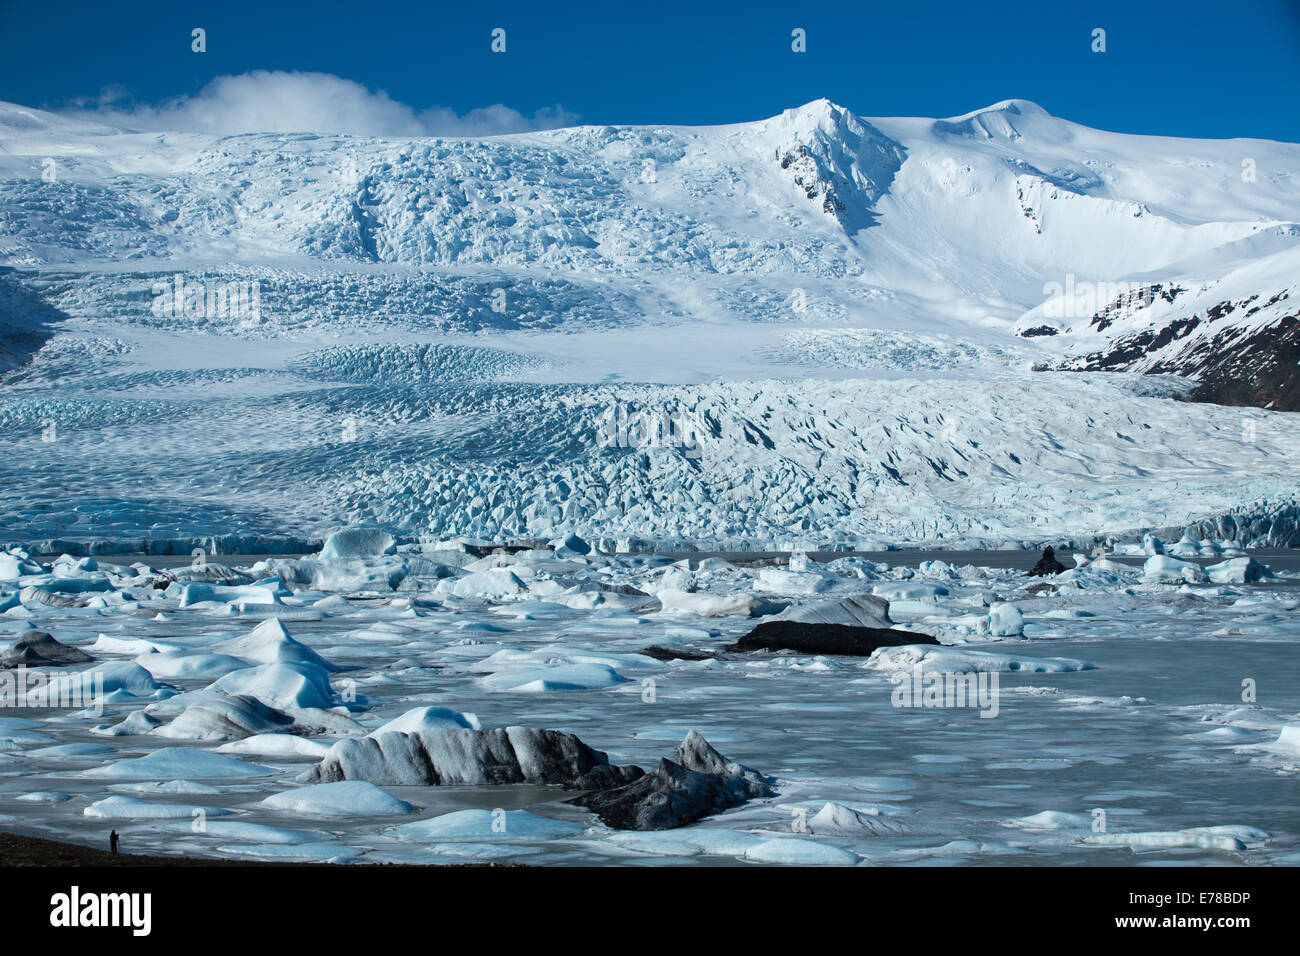 the Vatnajokull Glacier decending to sea level at Fjallsarlon, eastern Iceland - Stock Image